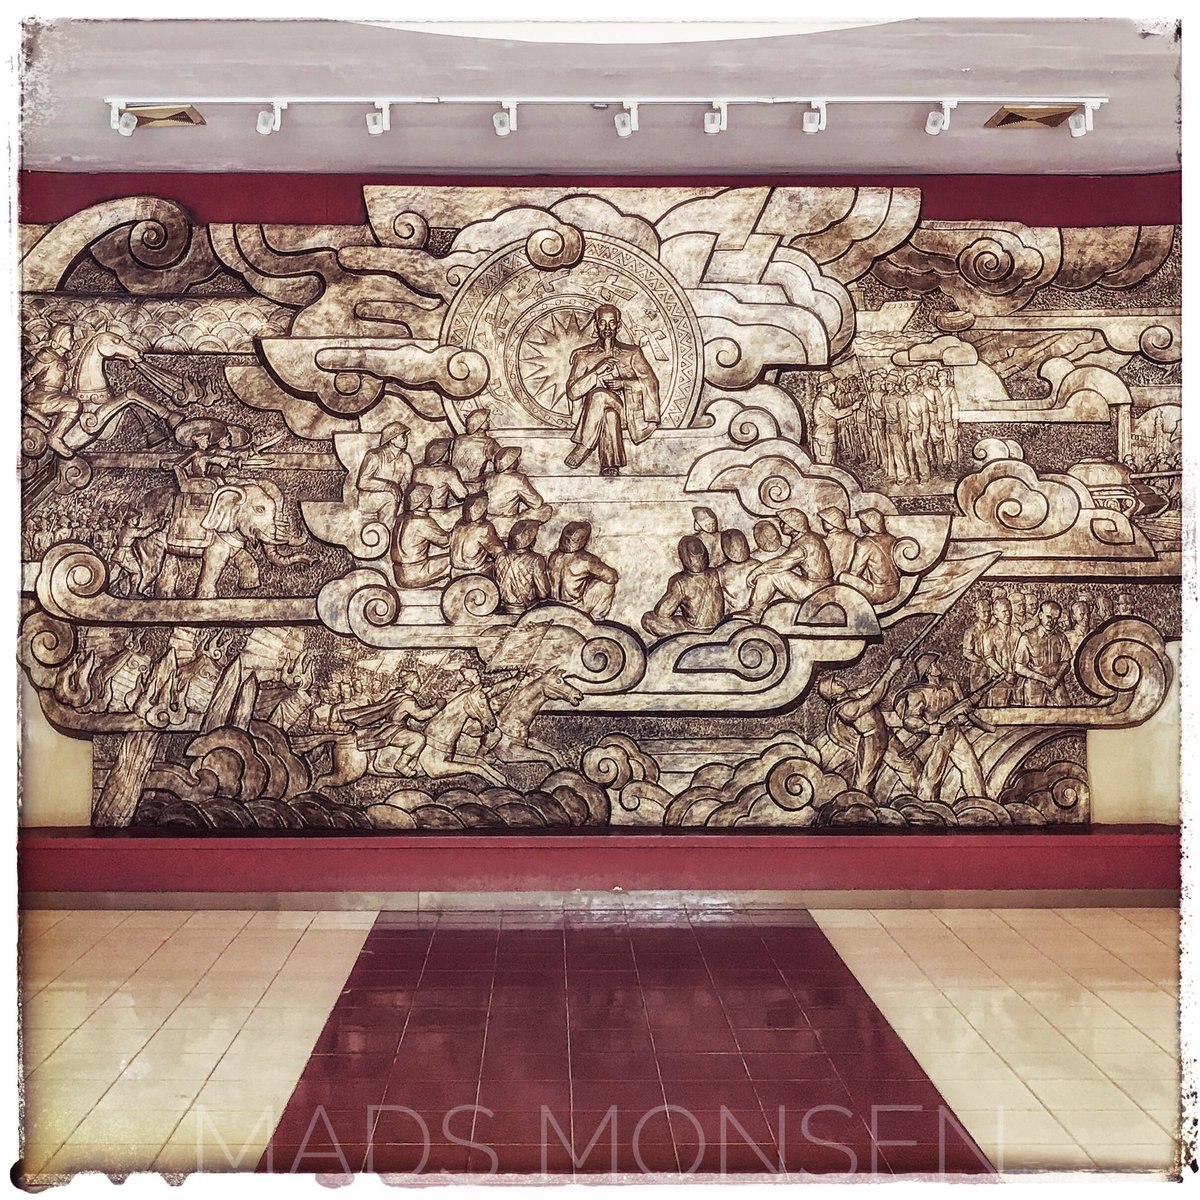 Wall mural. Vietnam Military History Museum, Hanoi. #iphonography #discovervietnam #hanoi #vietnam #mural #travel https://t.co/cHbLWq6Fcg